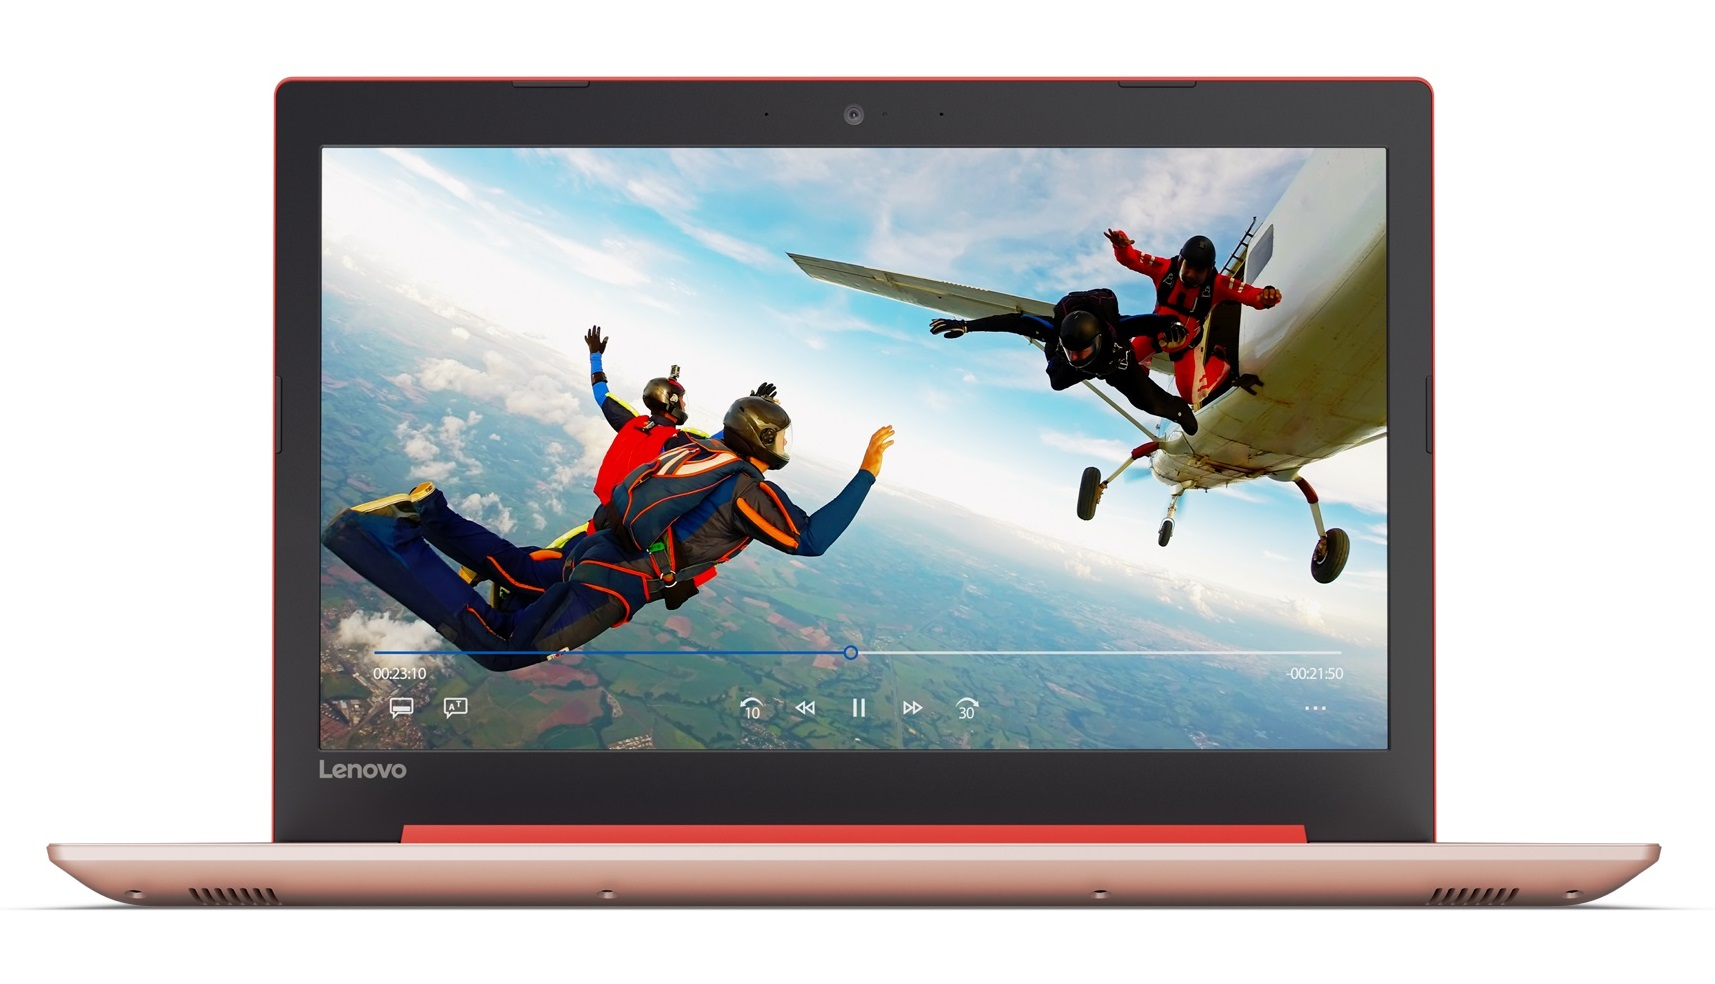 Фото  Ноутбук Lenovo ideapad 320-15IKB Coral Red (80XL043FRA)